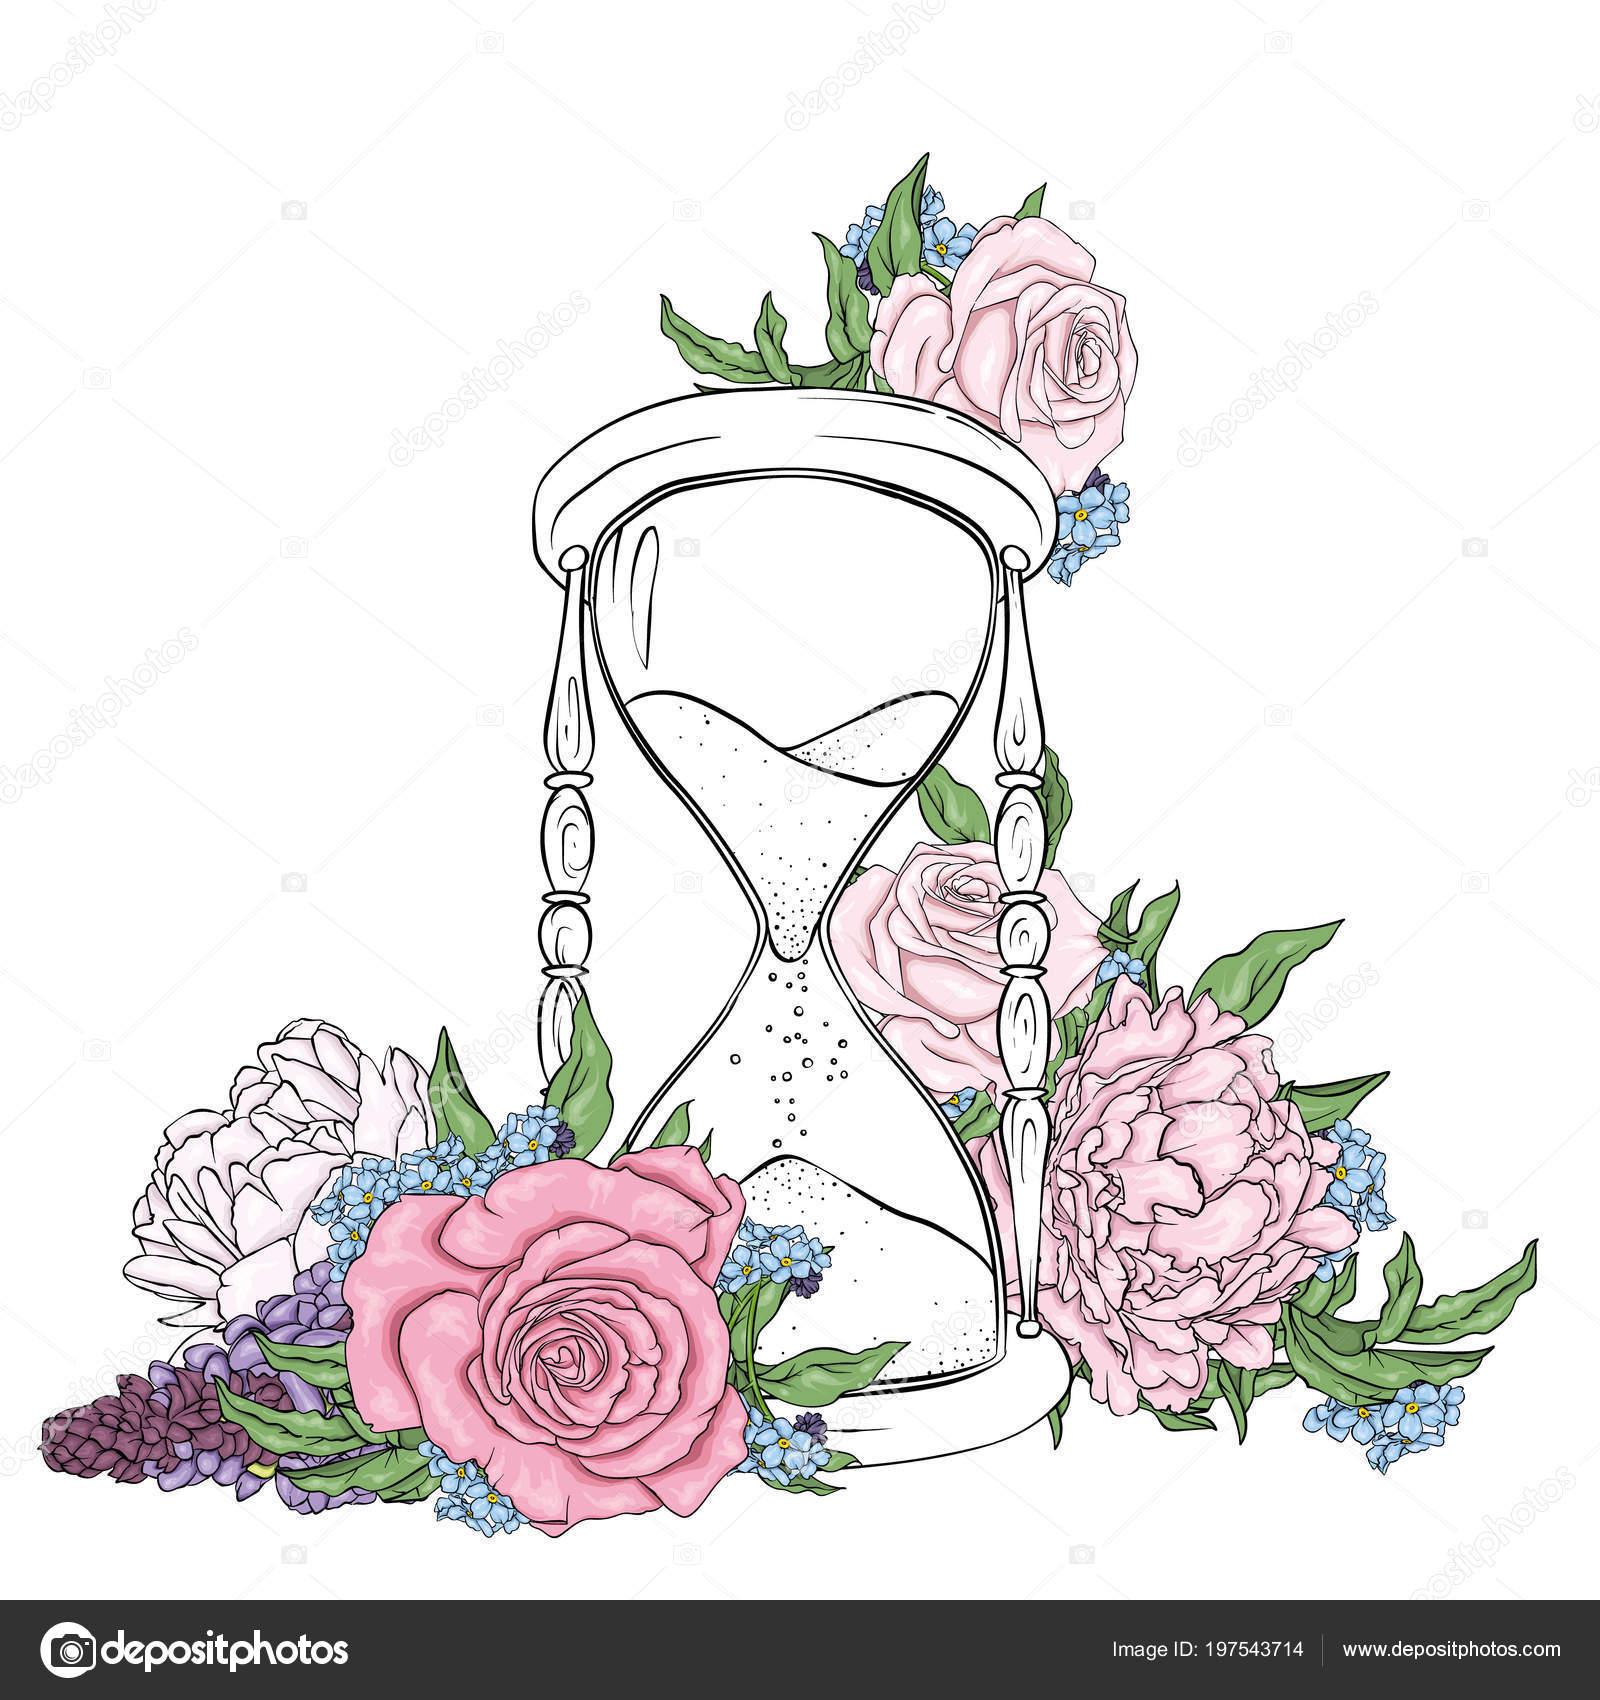 Imágenes Las Flores Mas Hermosas Para Dibujar Antiguo Reloj Arena